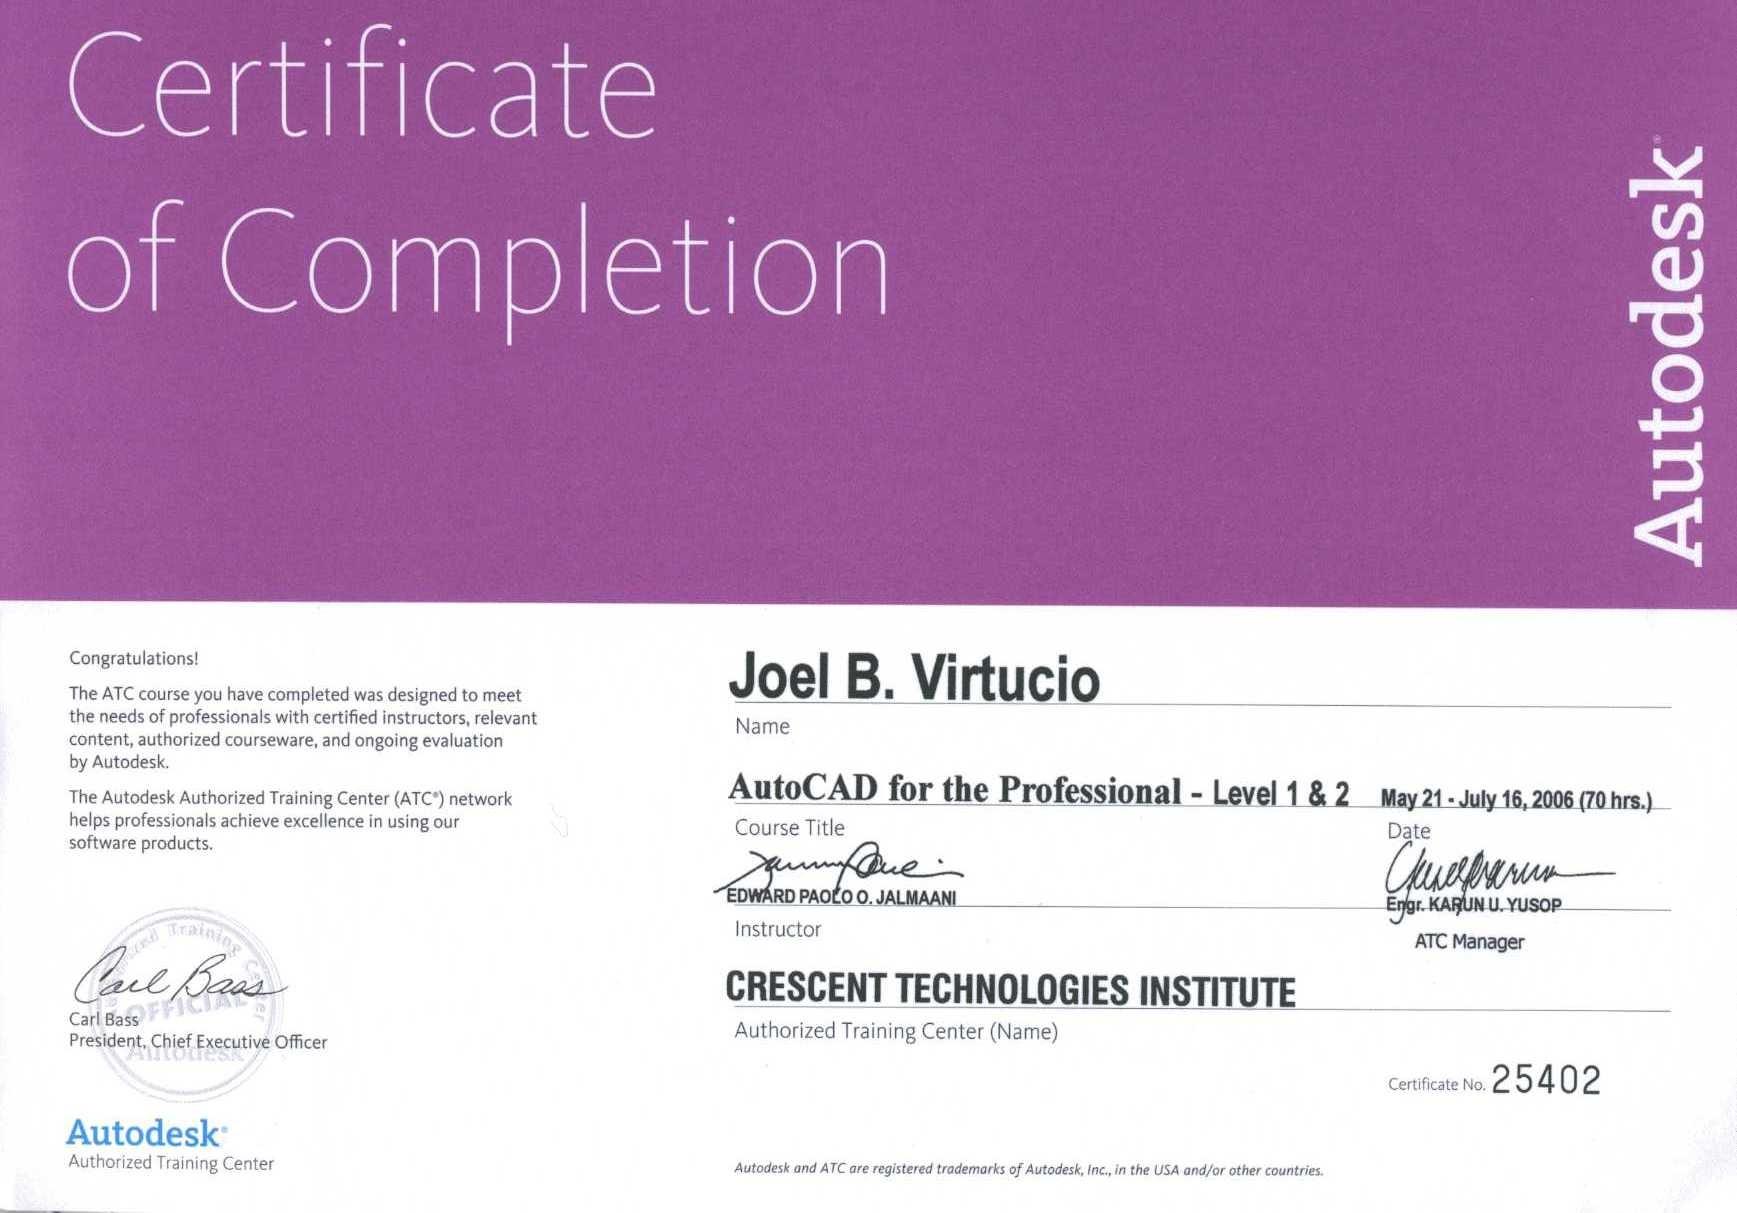 Joel virtucio bayt autocad for professional level 1 2 certificate xflitez Gallery